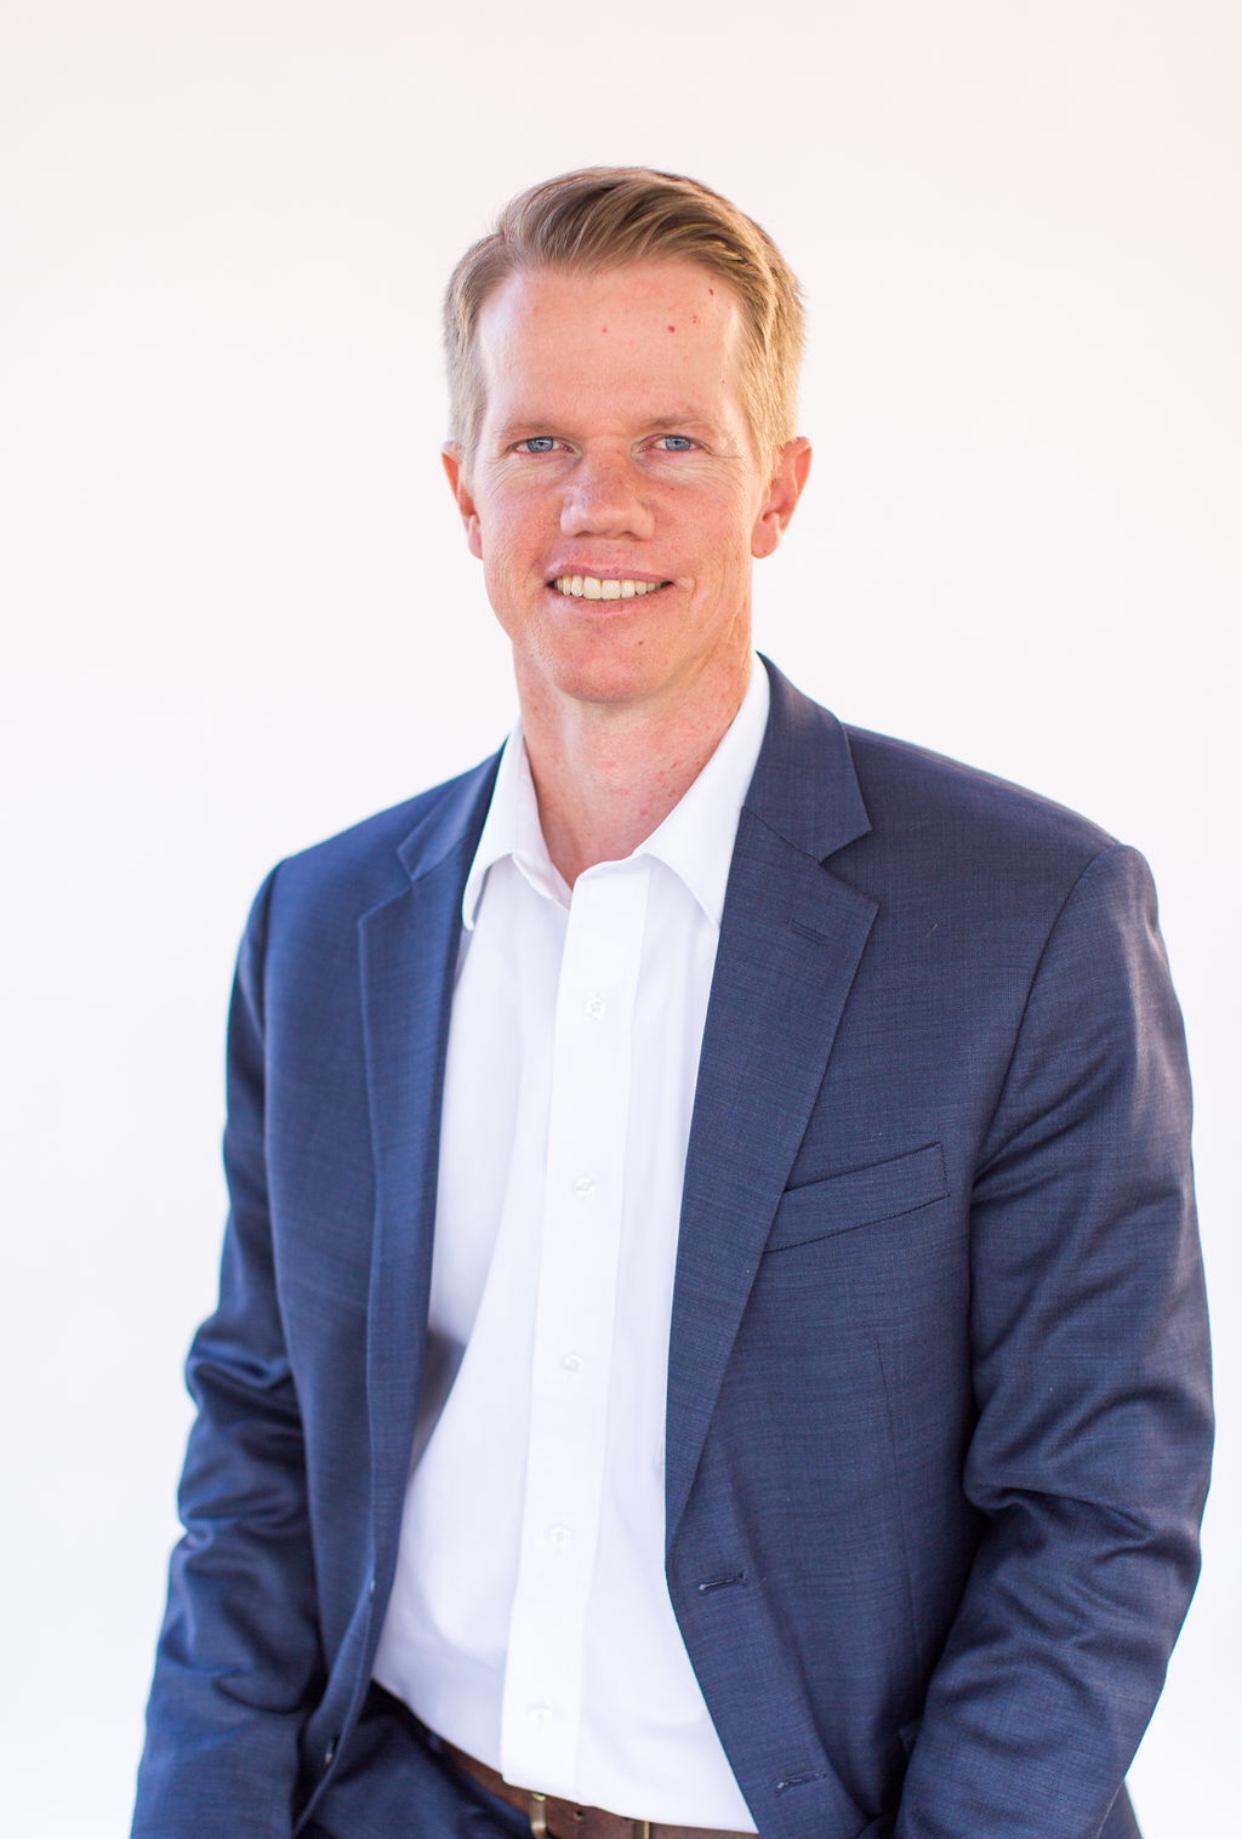 Adam Wright, MBA